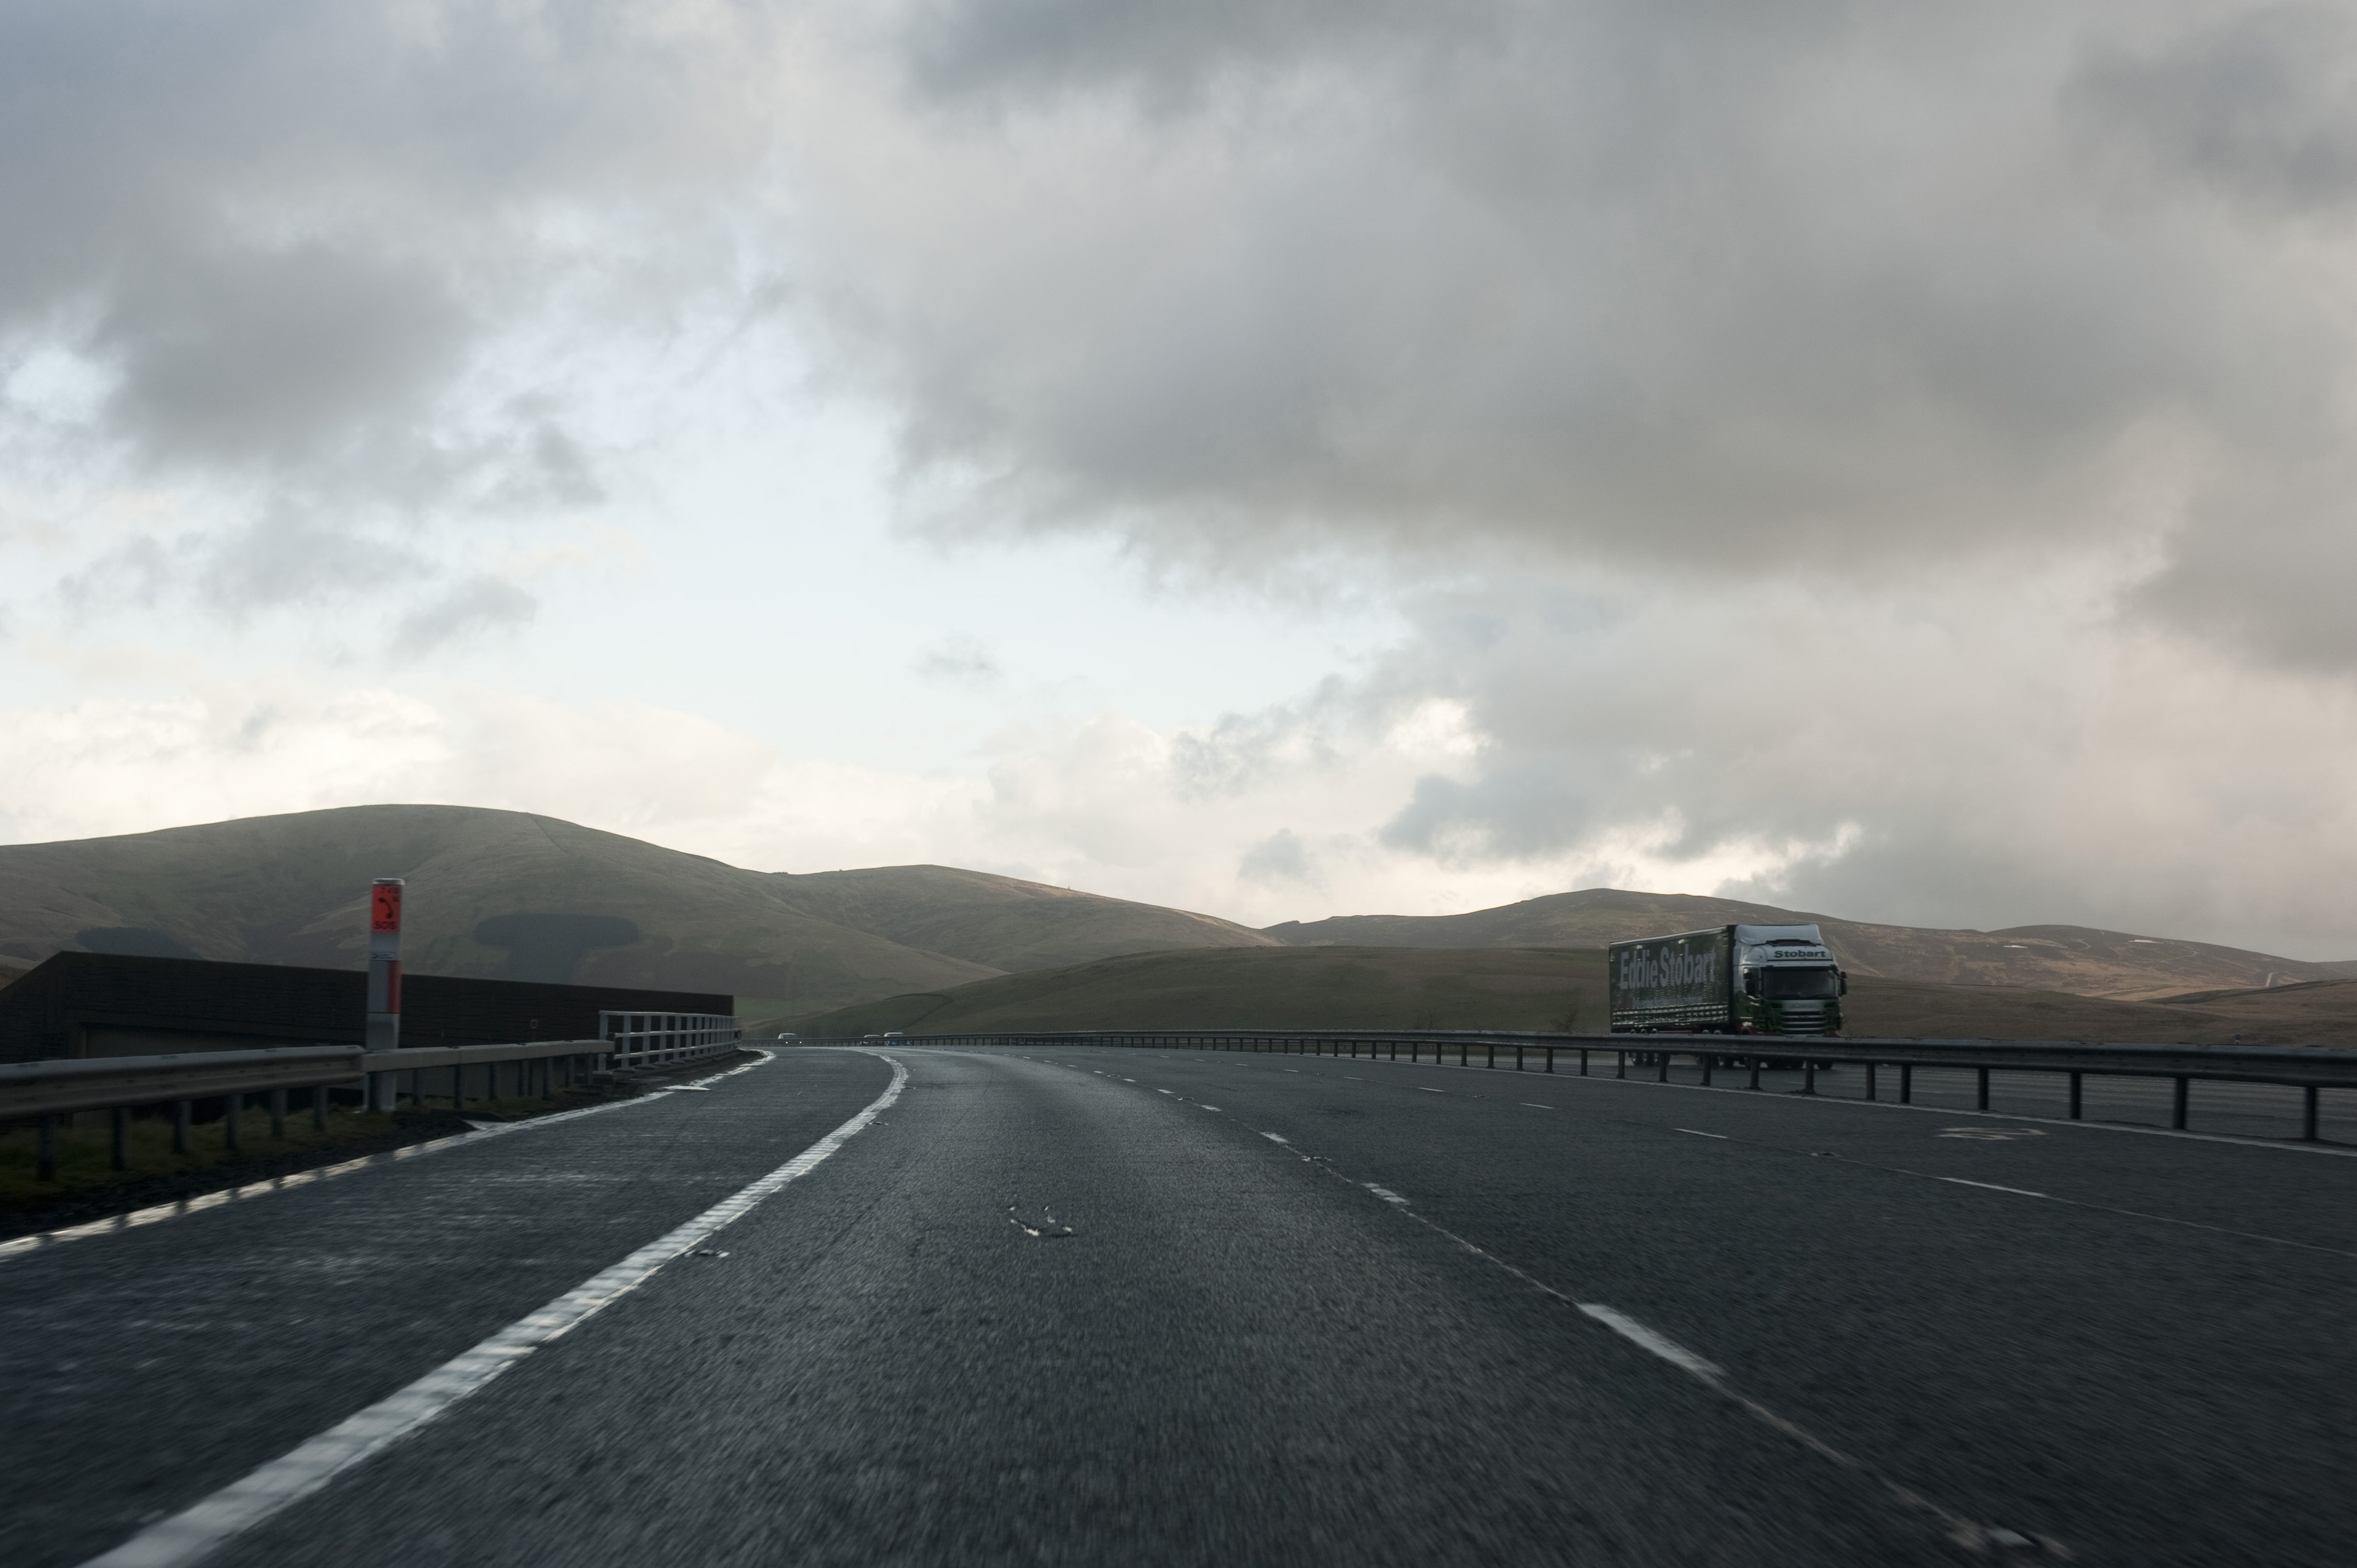 Used Work Trucks >> Image of Traveling on a freeway | Freebie.Photography